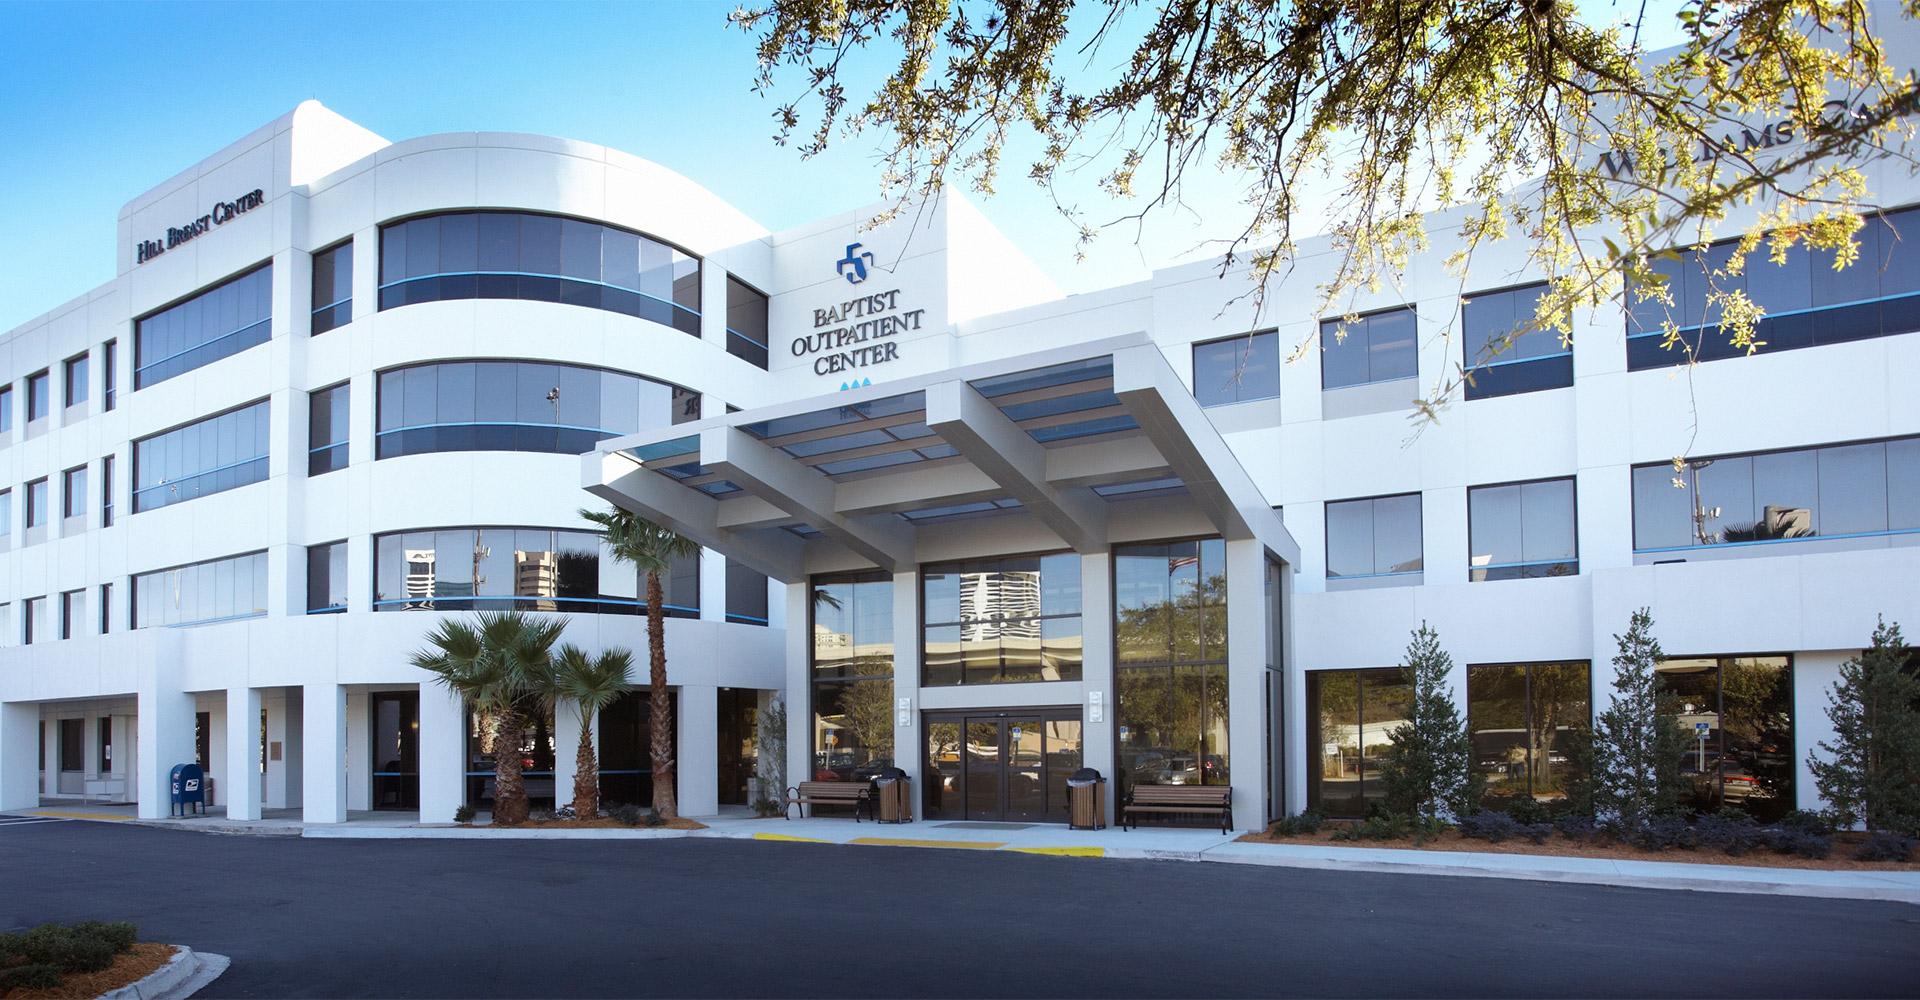 Baptist Medical Center Exterior.